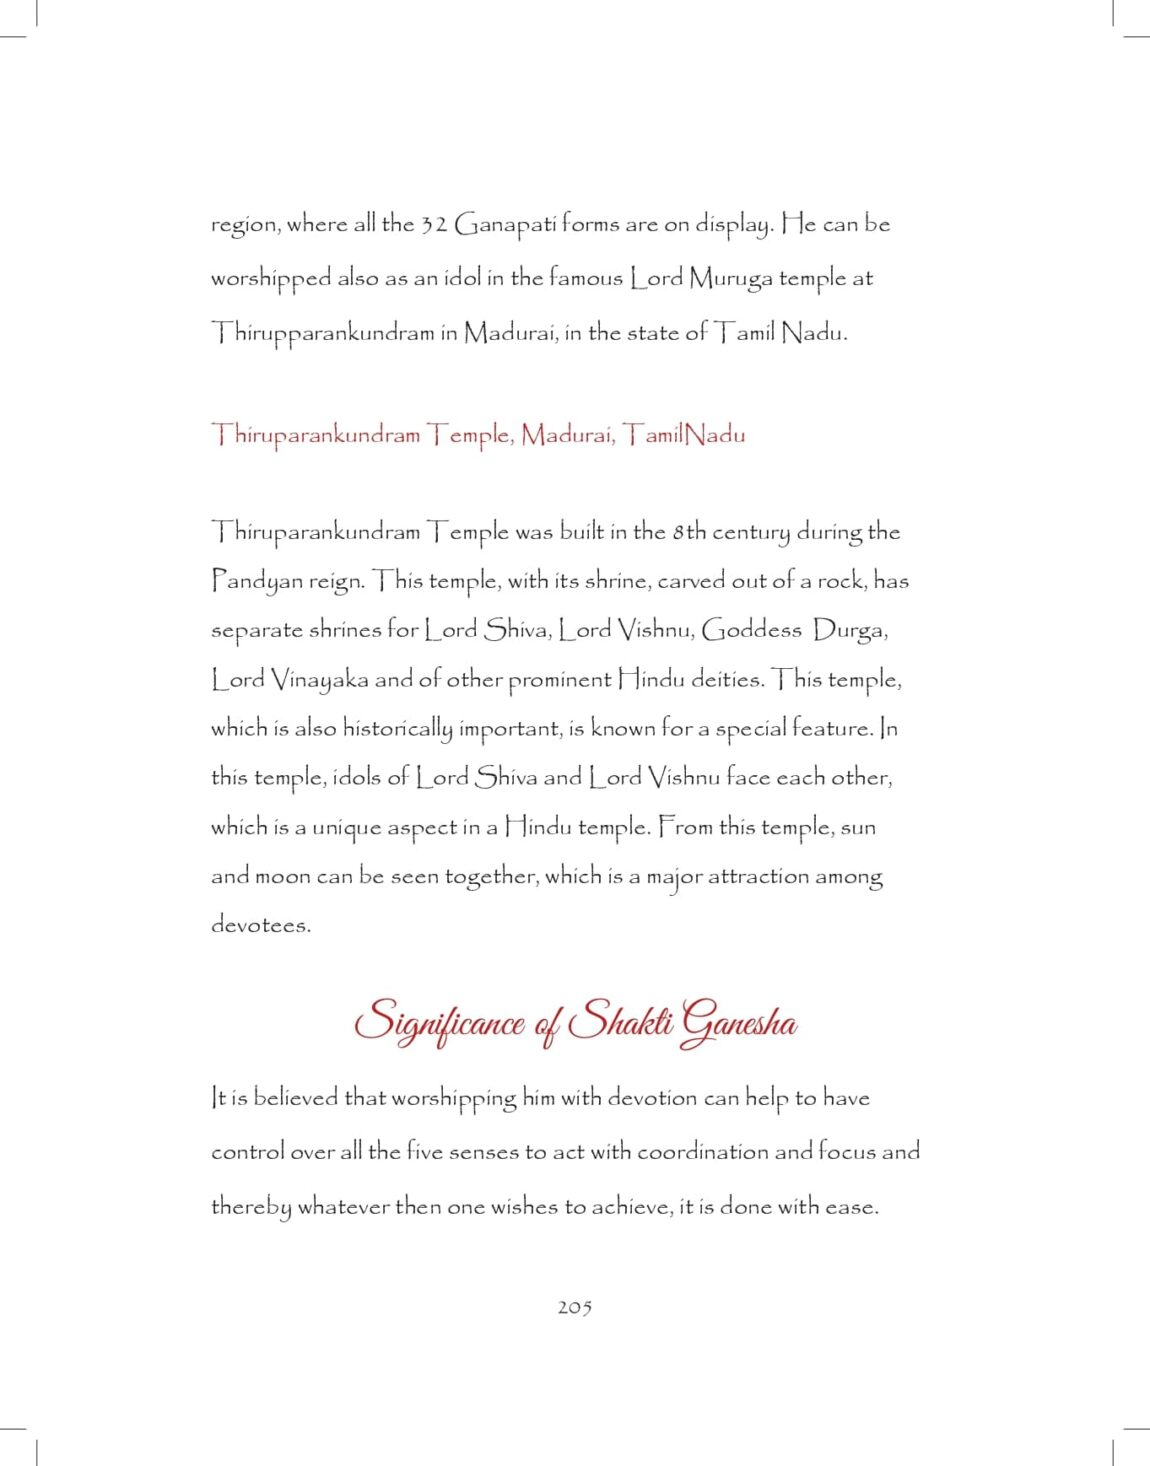 Ganesh-print_pages-to-jpg-0205.jpg